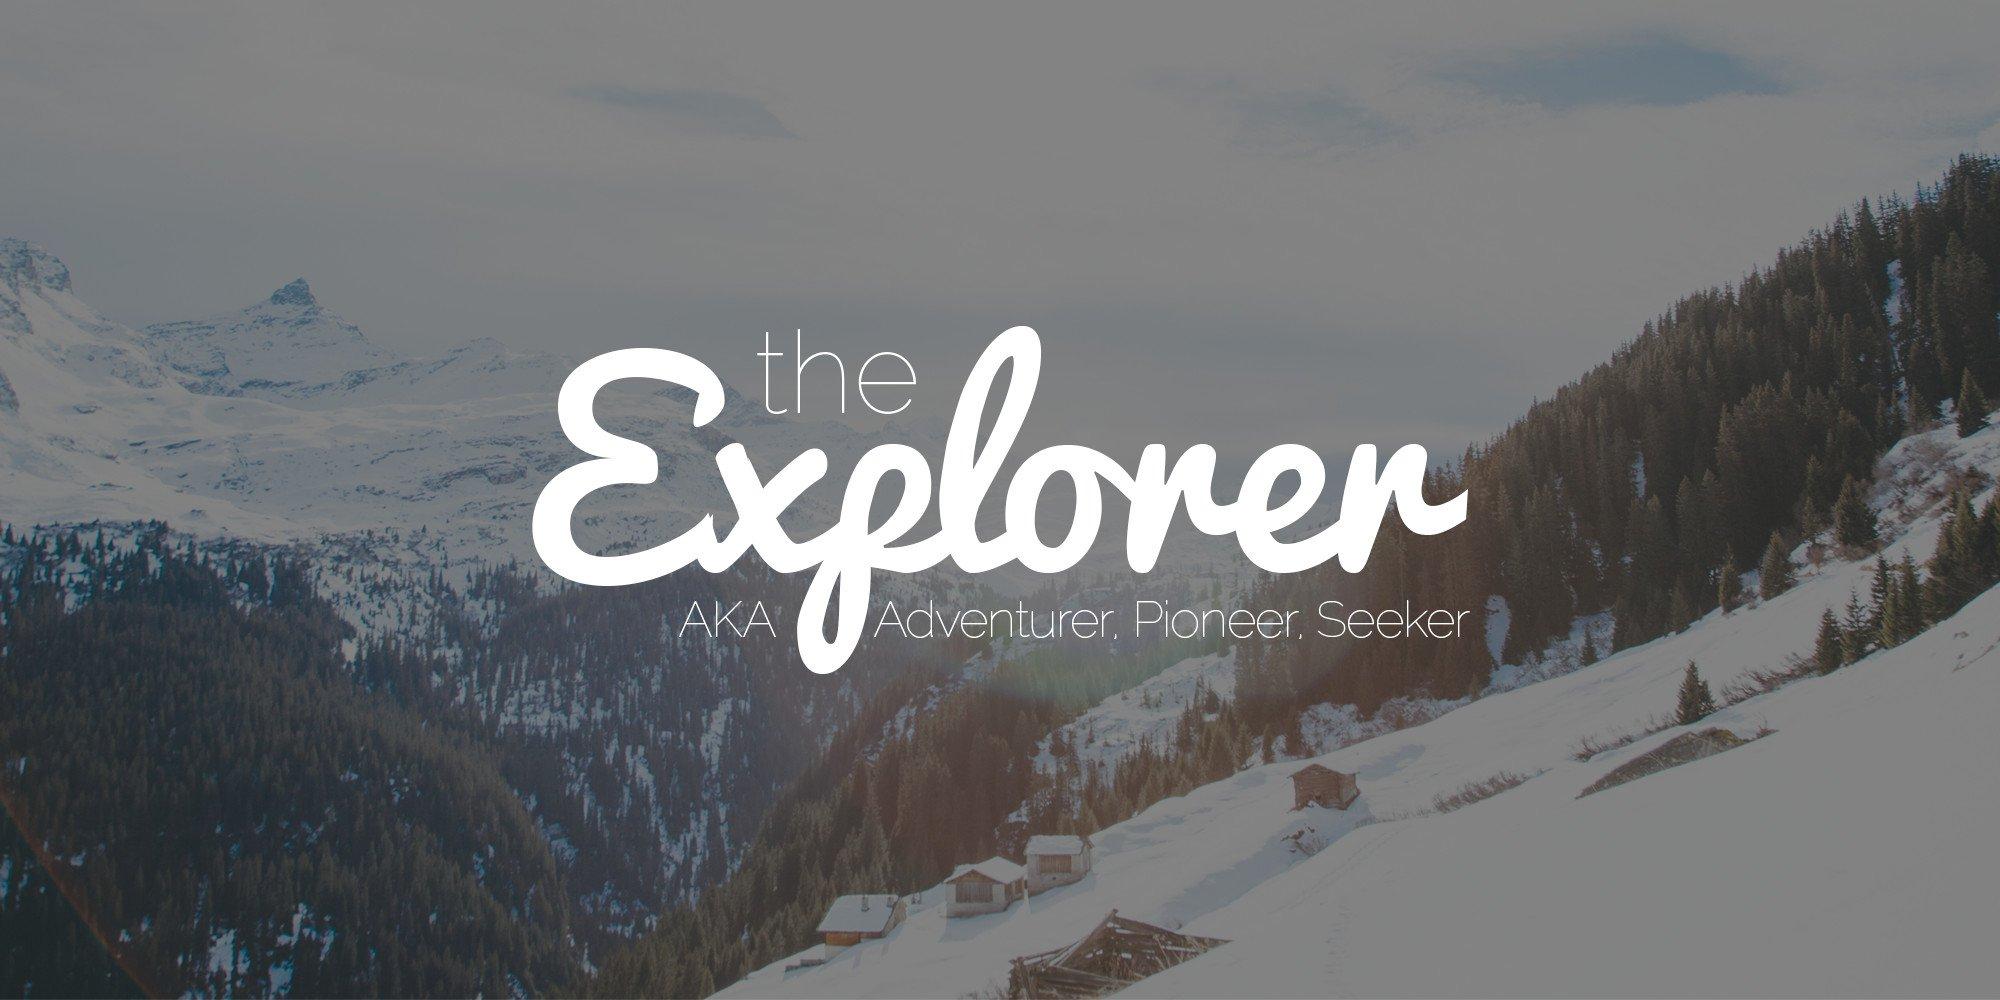 Explorer Brandfluency Course